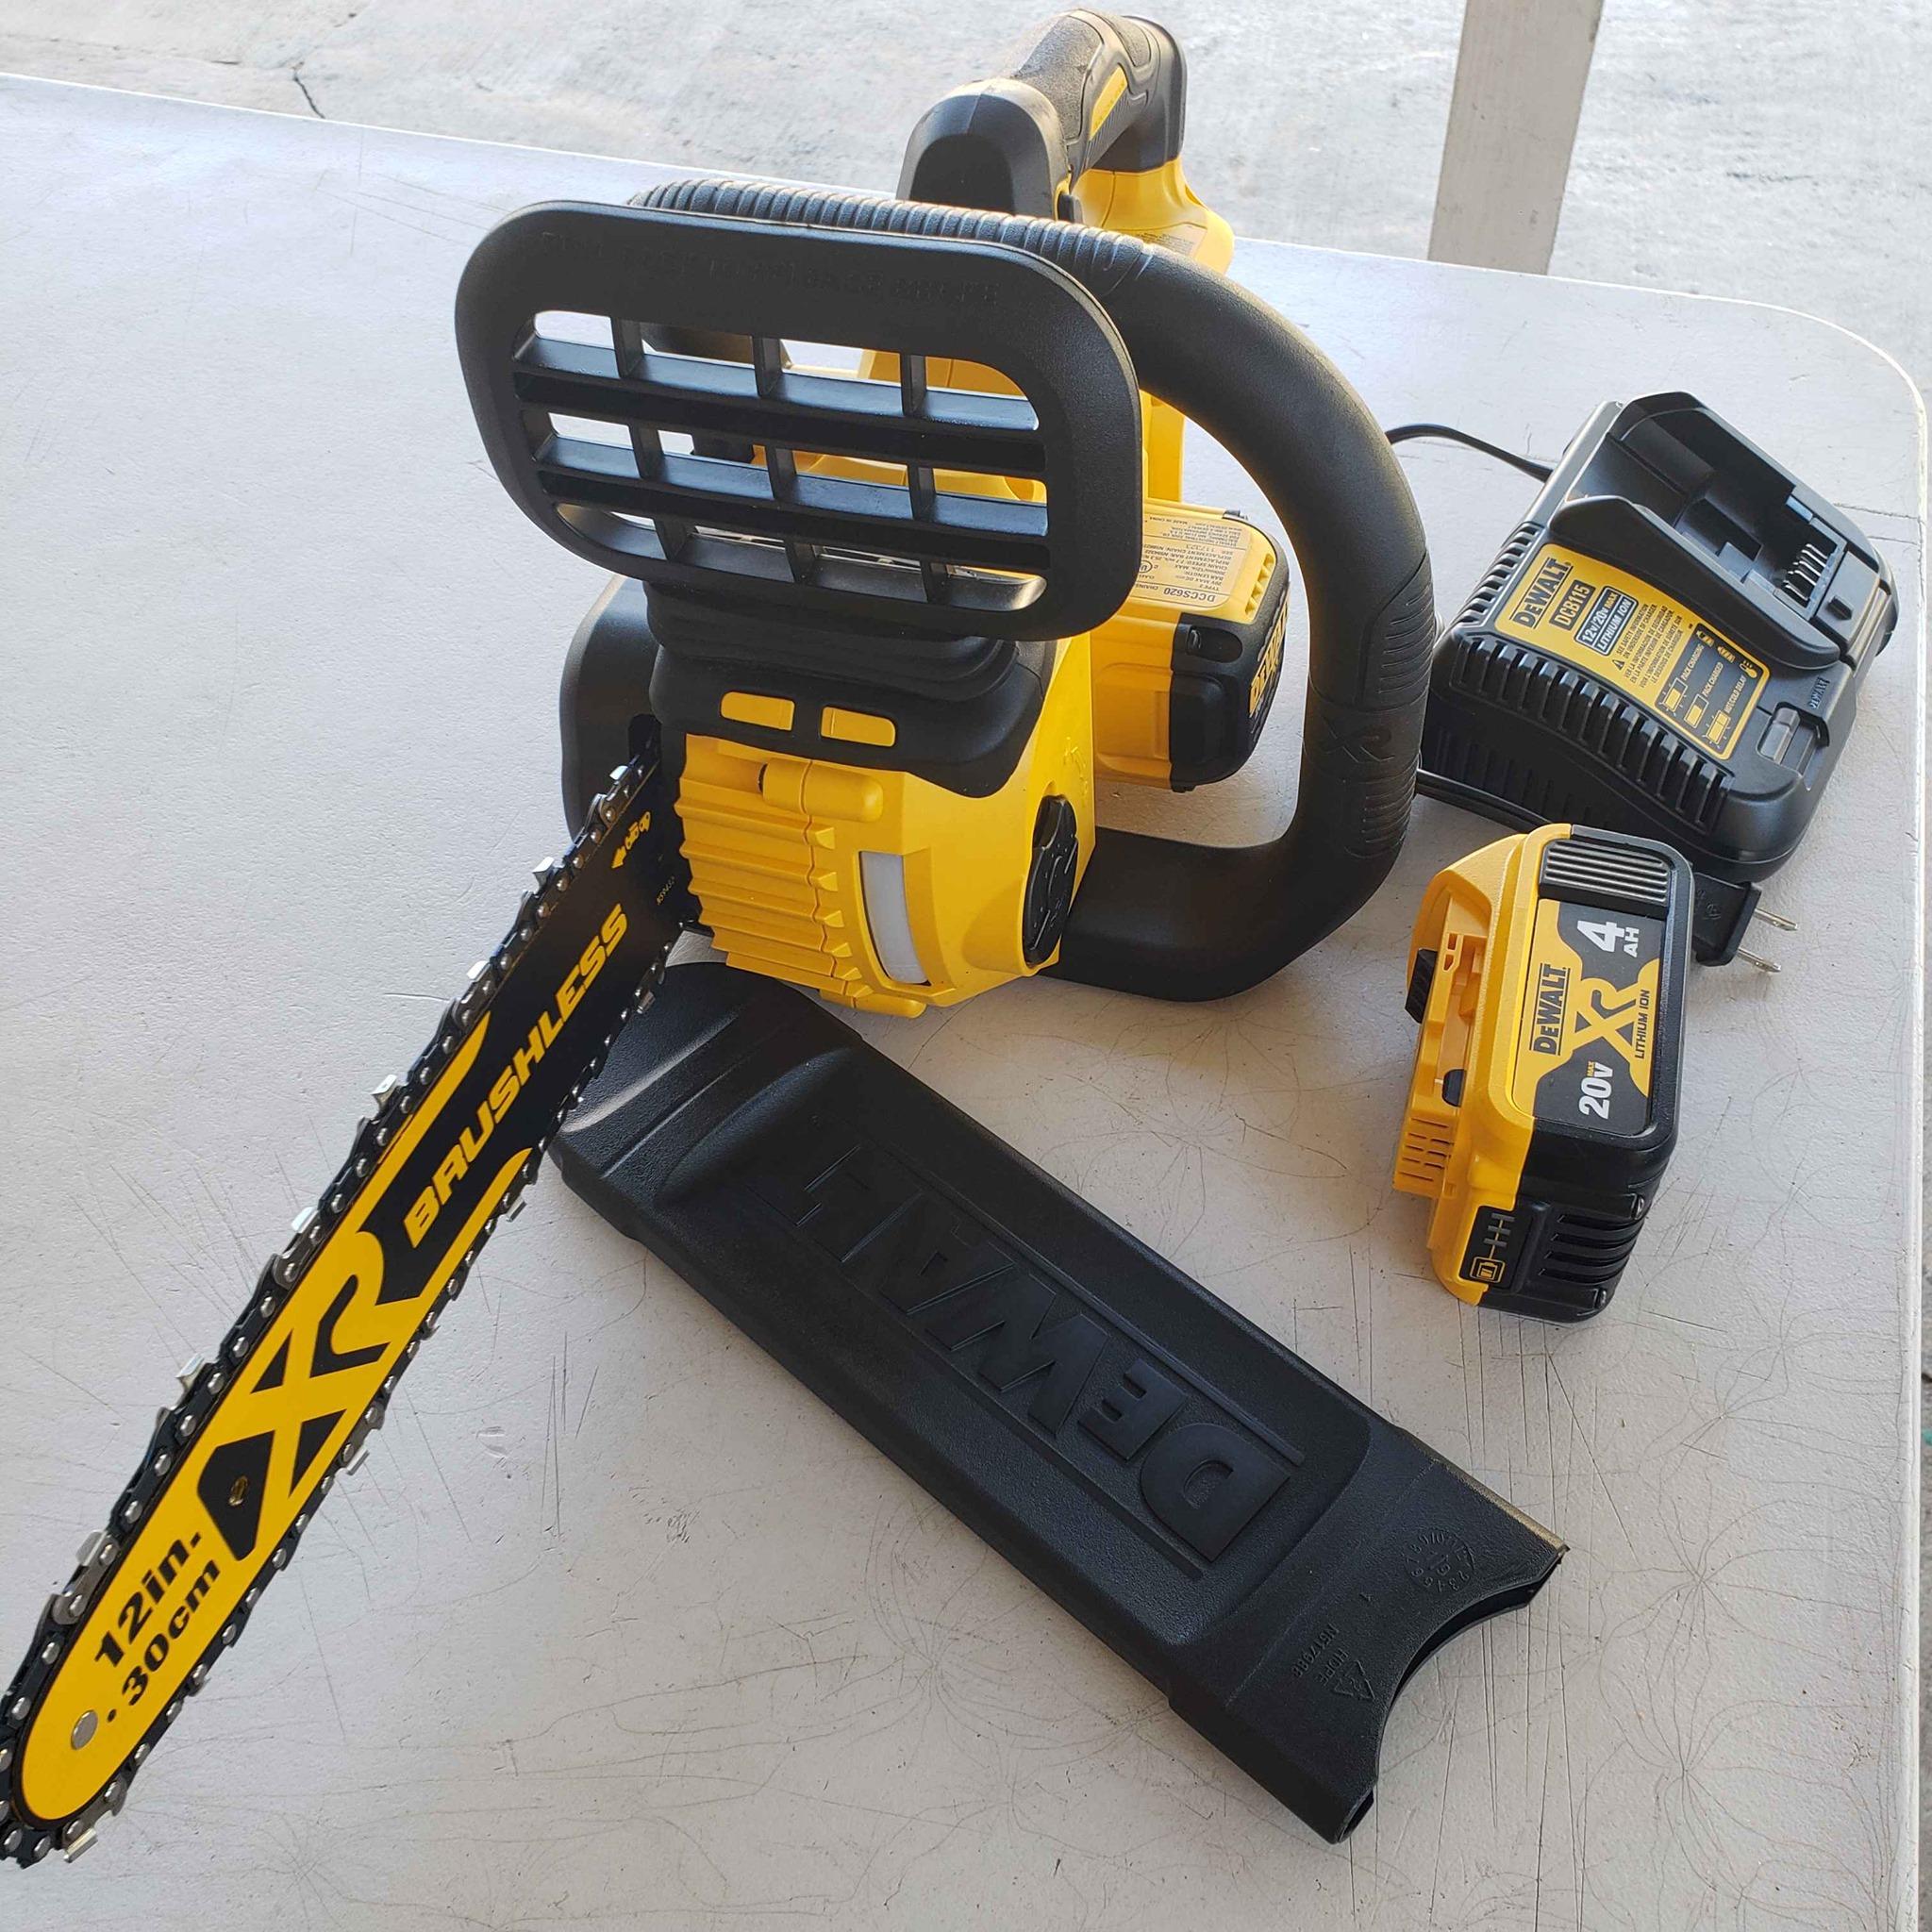 dewalt 20v chainsaw review